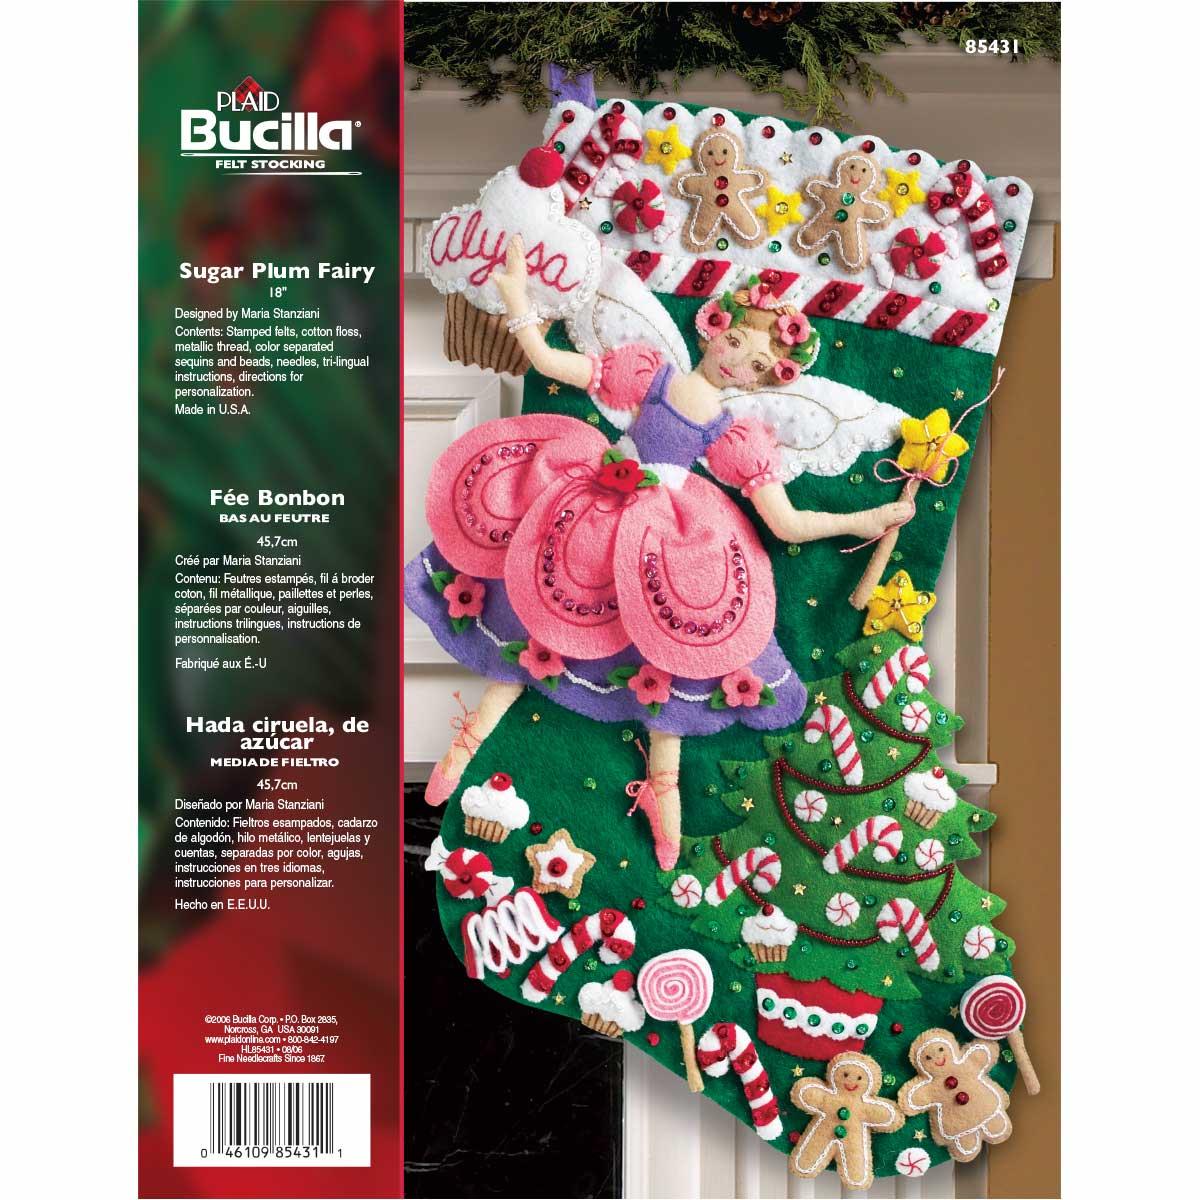 Bucilla ® Seasonal - Felt - Stocking Kits - Christmas Sugar Plum Fairy - 85431